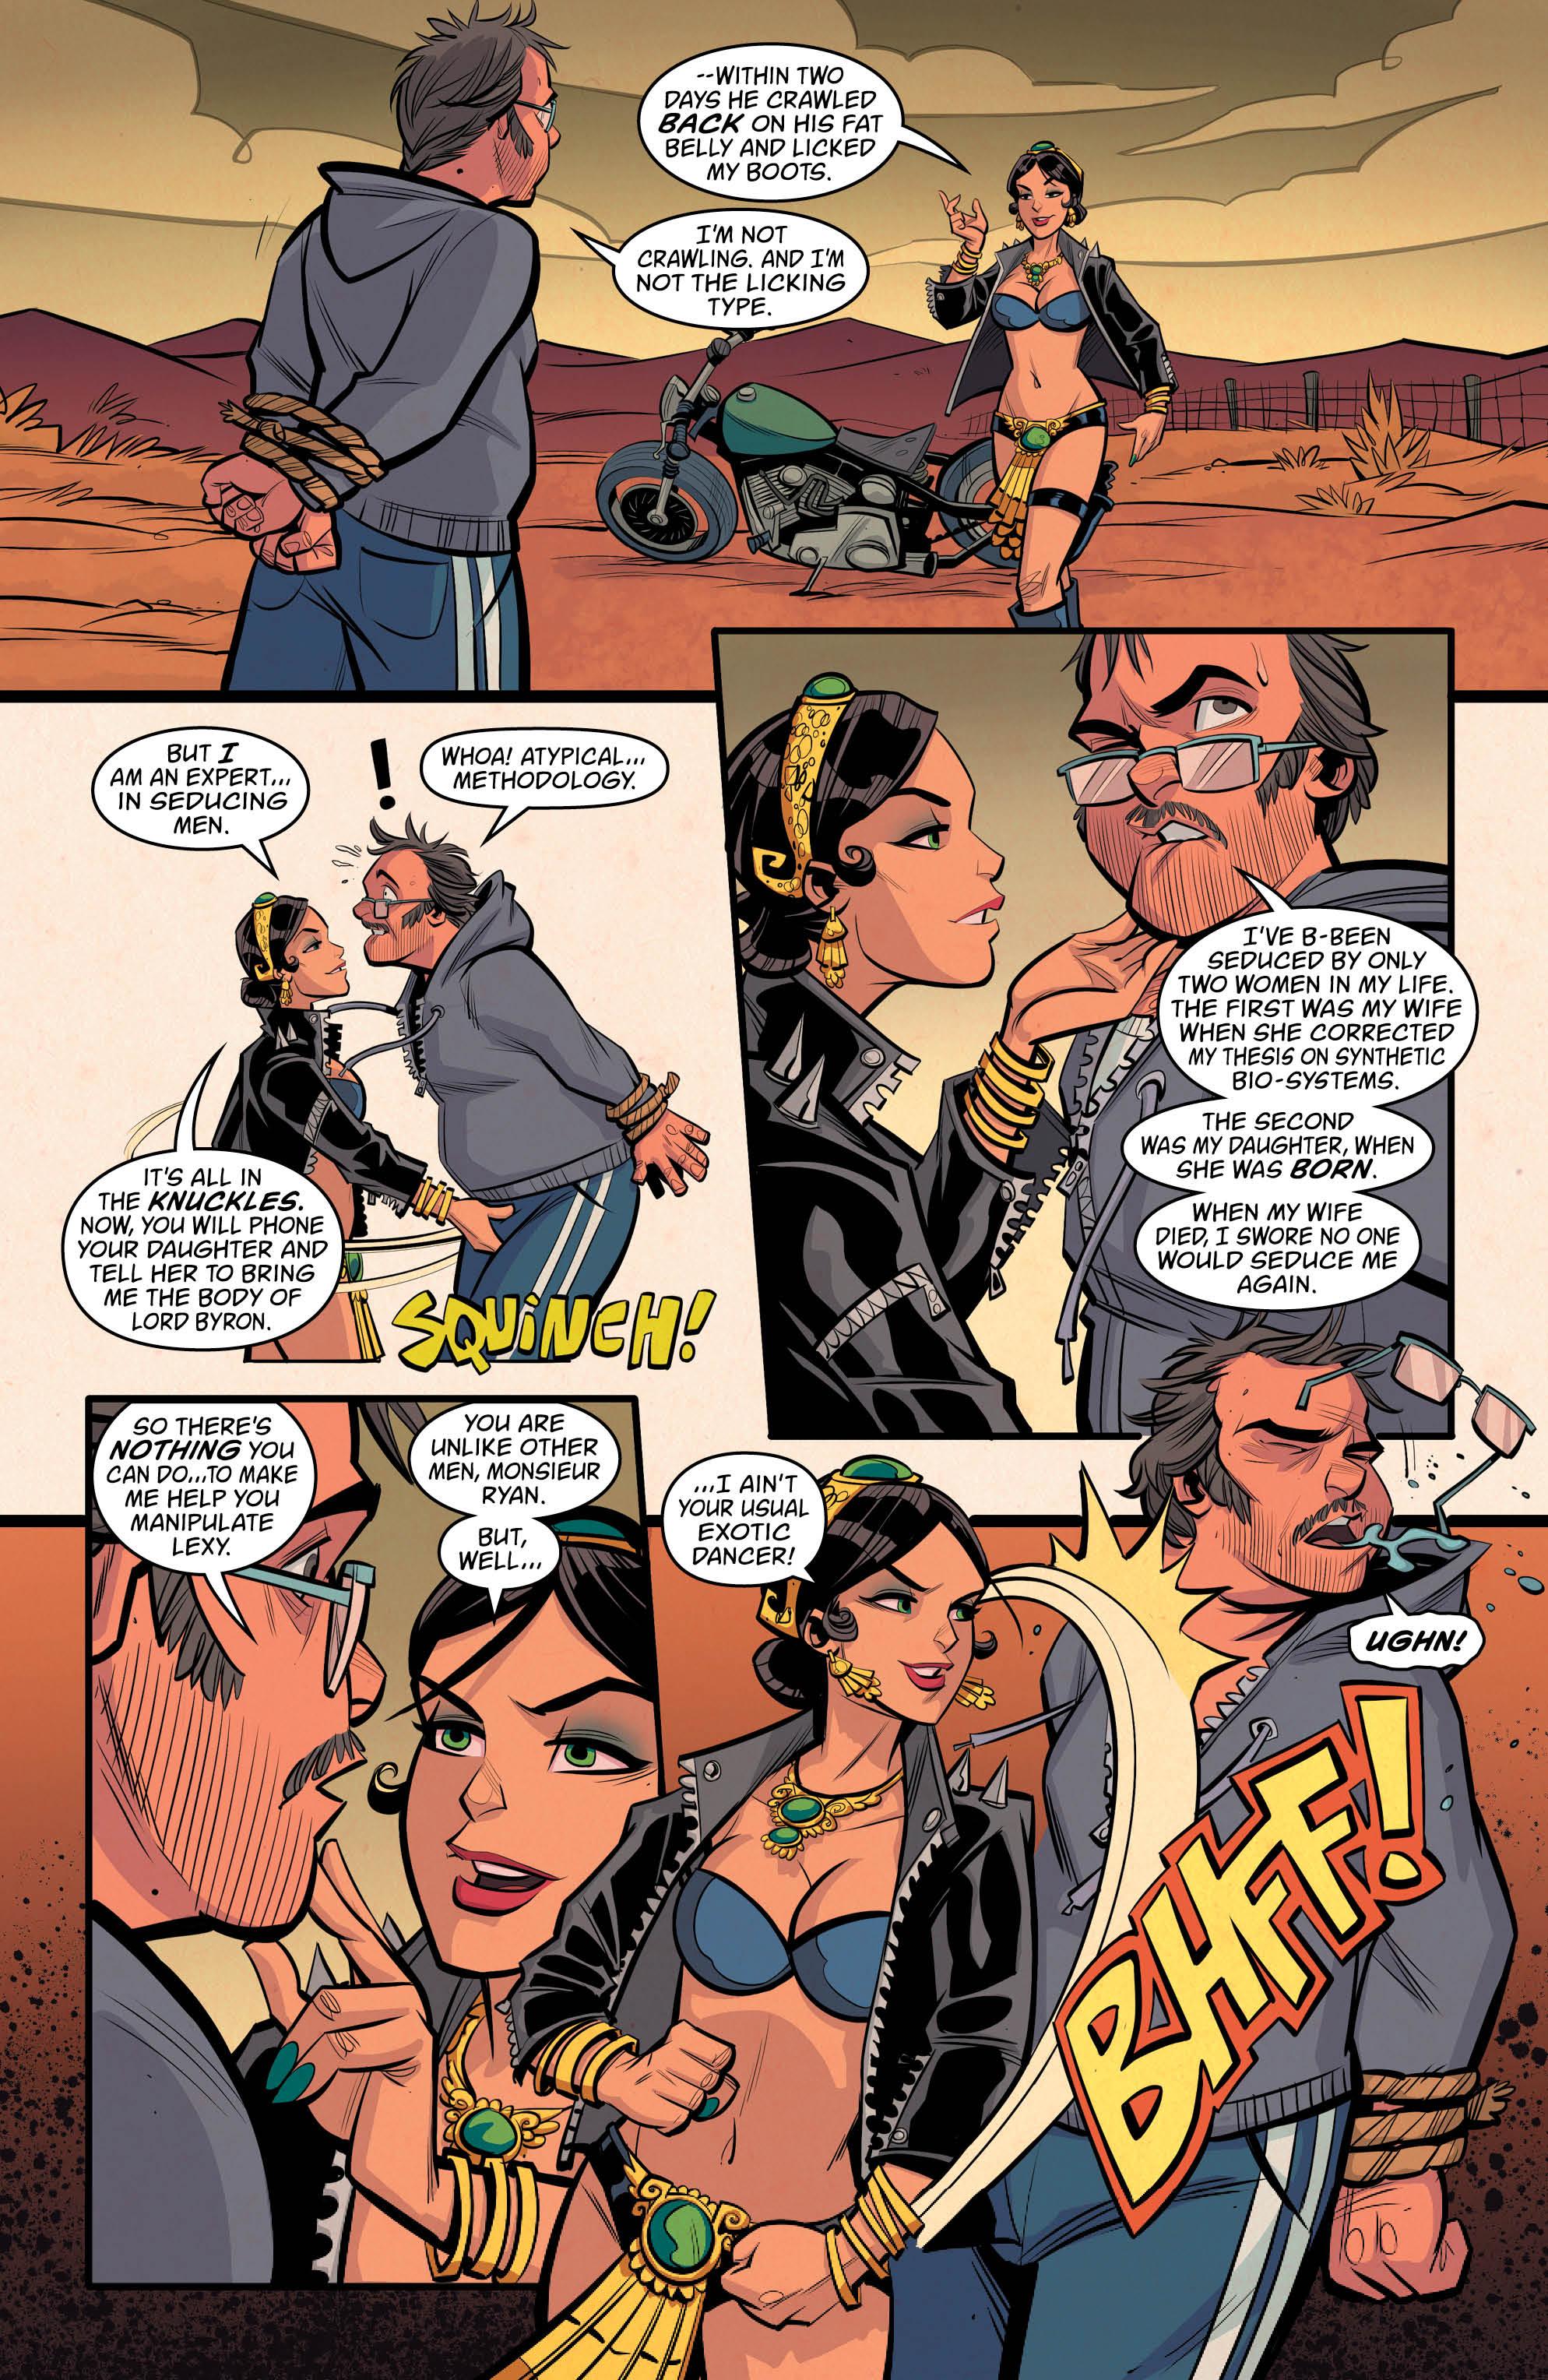 NEW ROMANCER #5 page 6